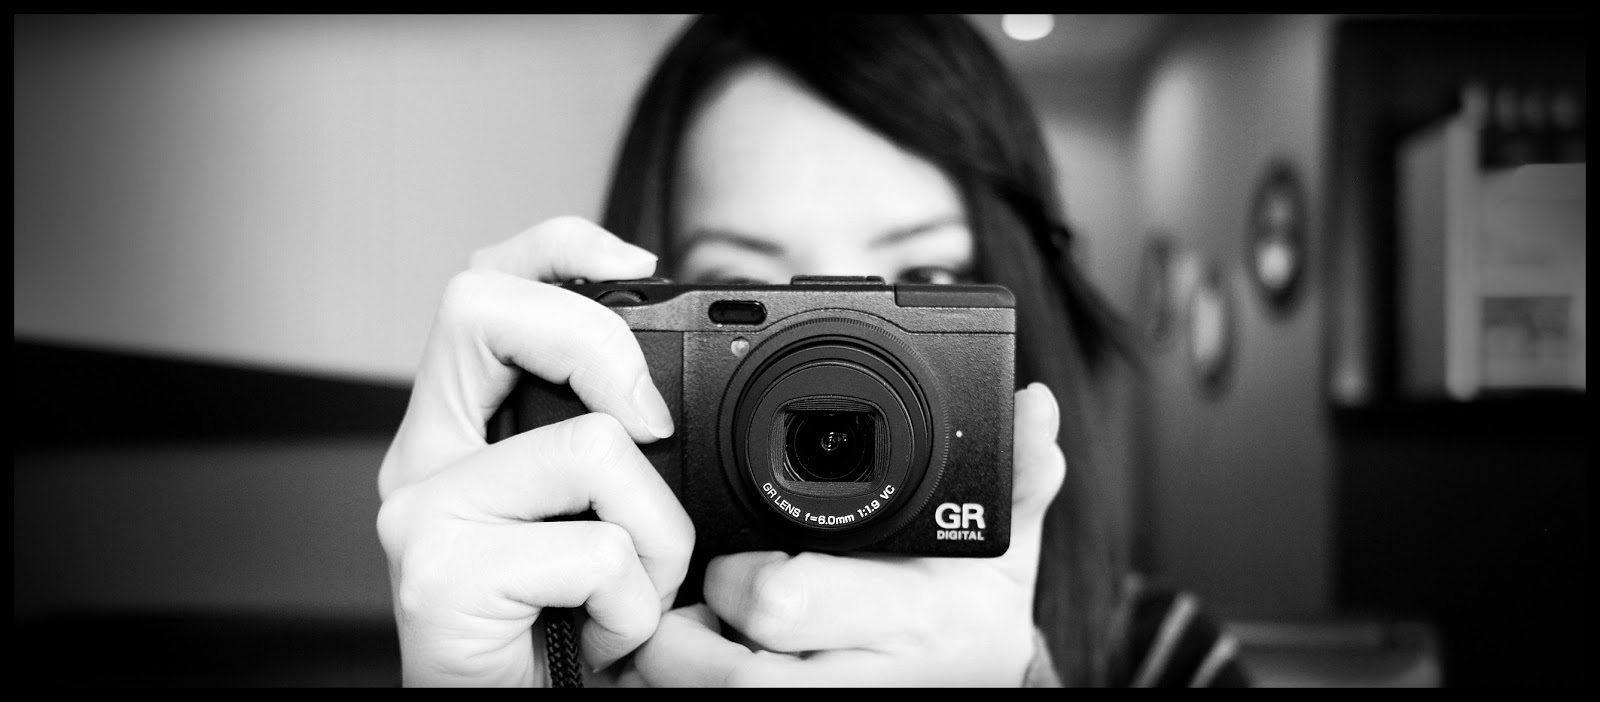 bigheadtaco com: Review: Ricoh GR D IV still a Great Camera!